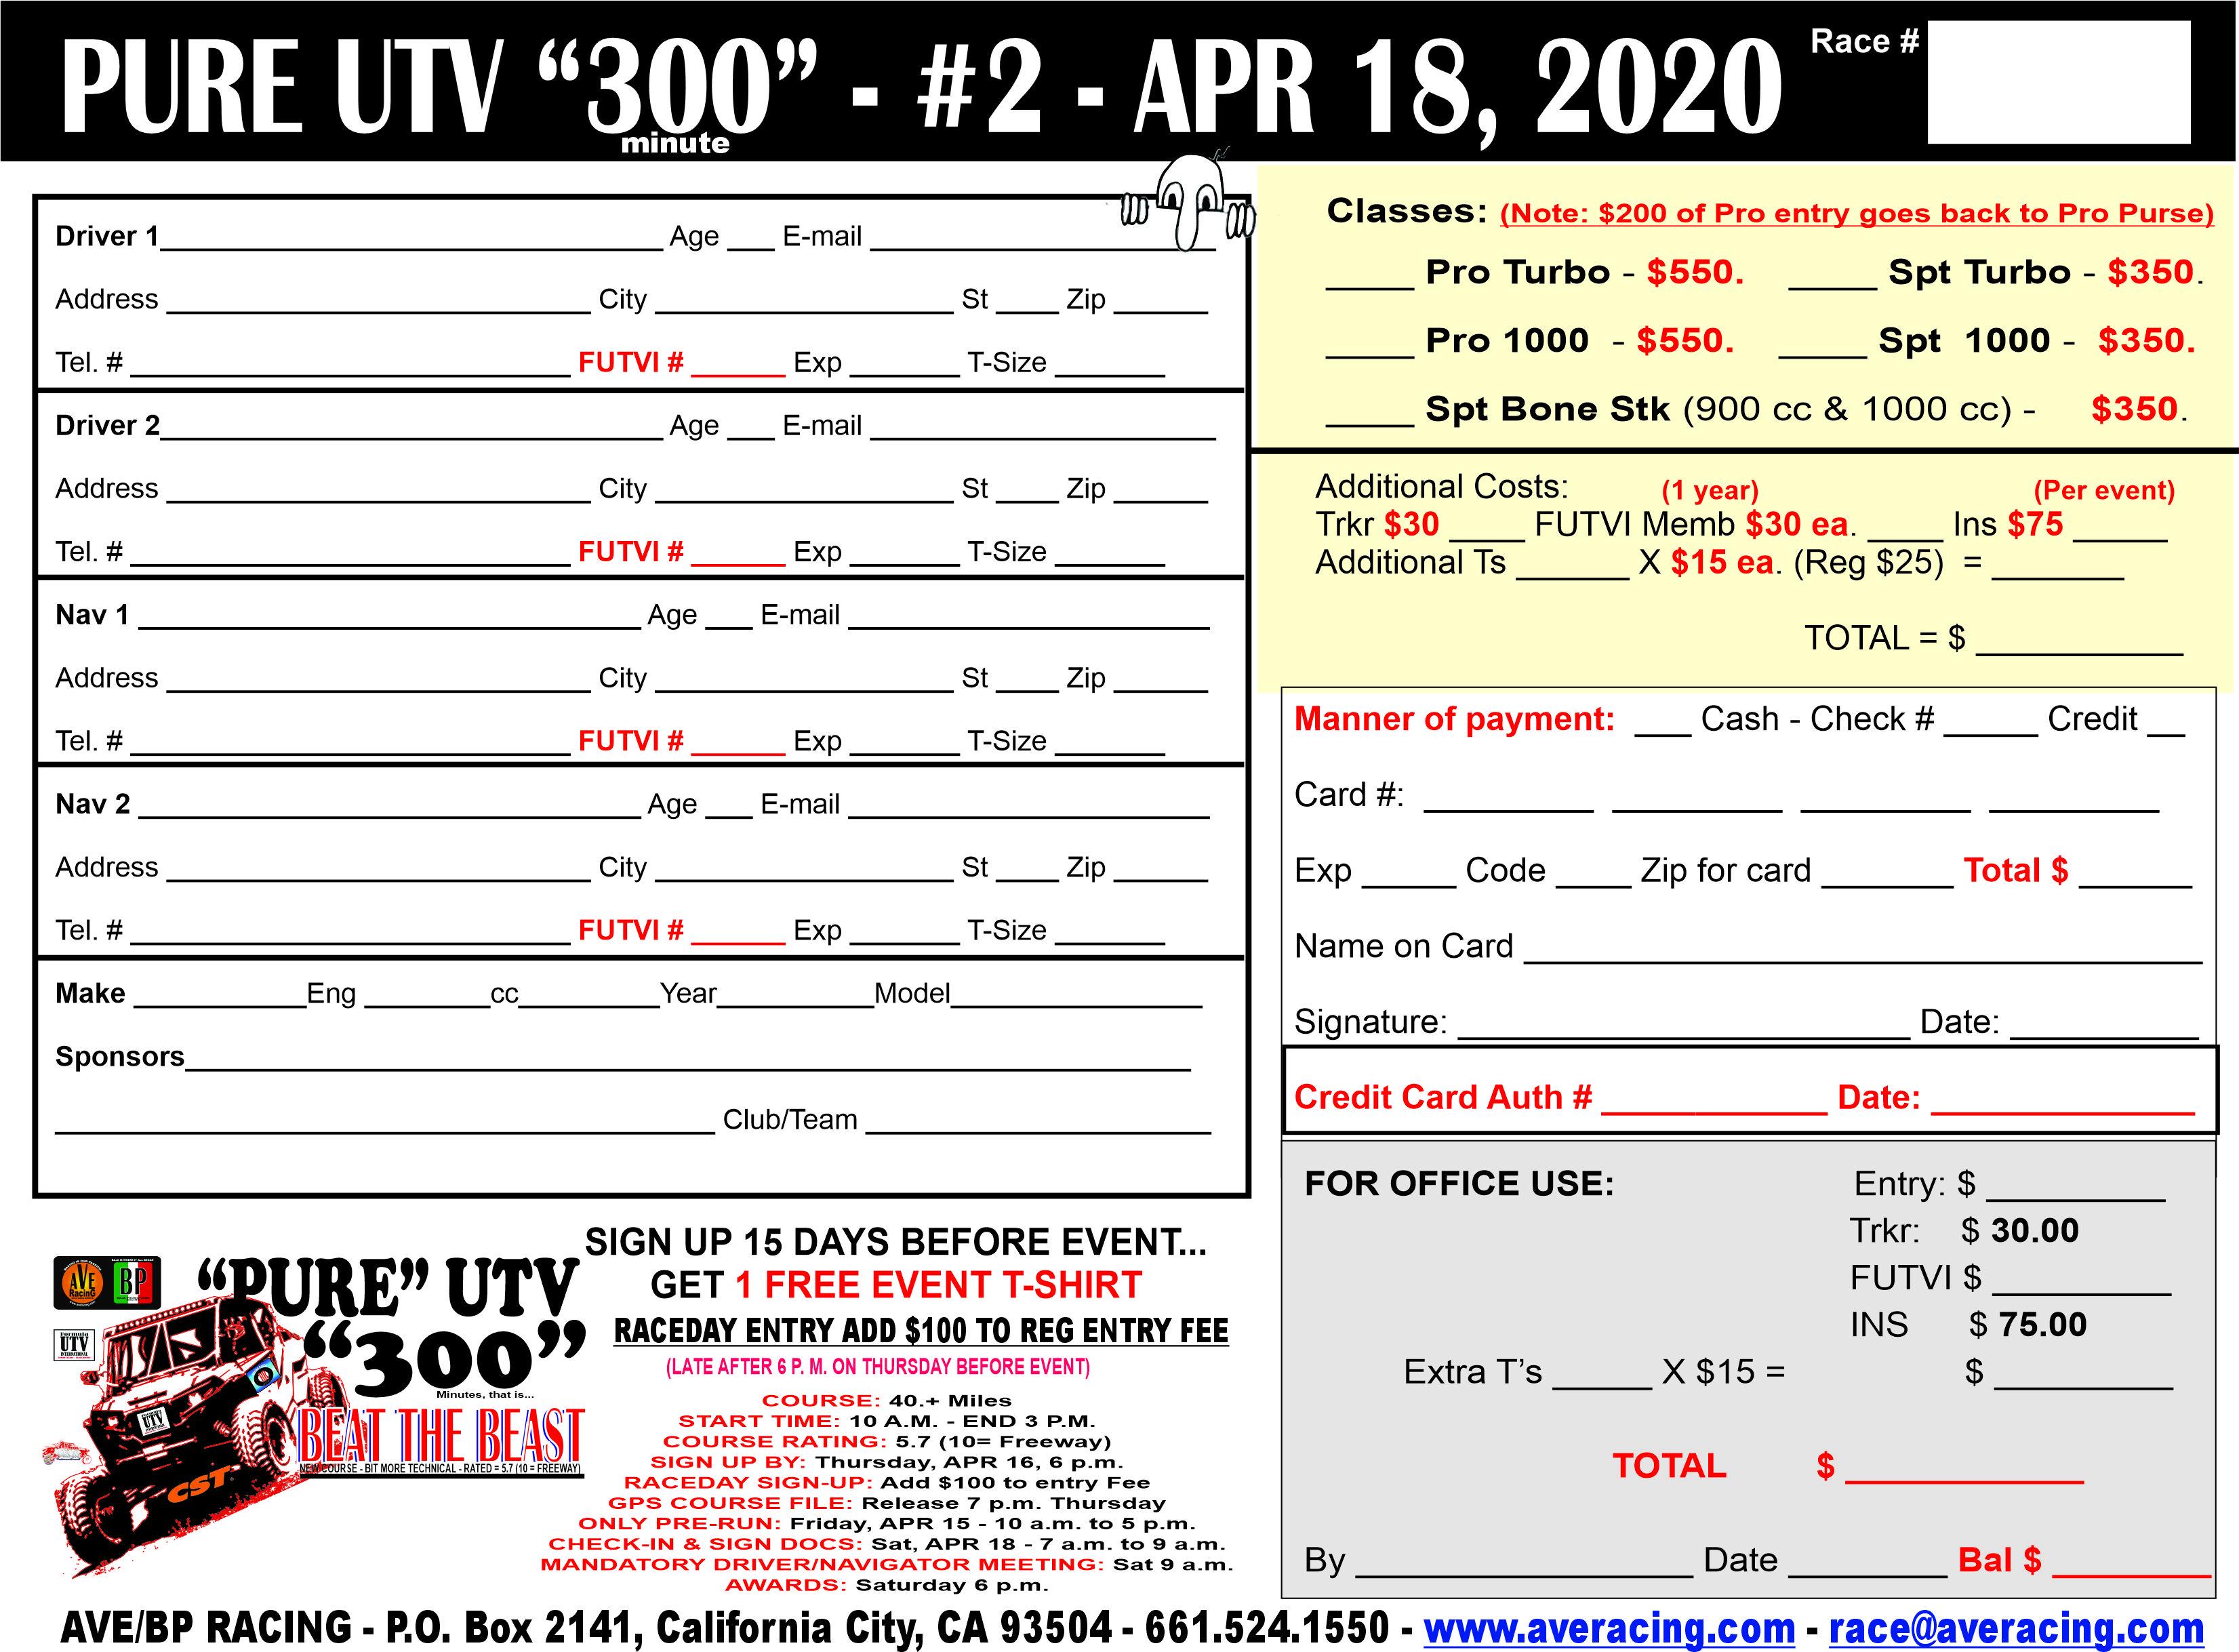 20-P300-#2-APR 18-ENTRY-UPDATED-Feb29.jpg